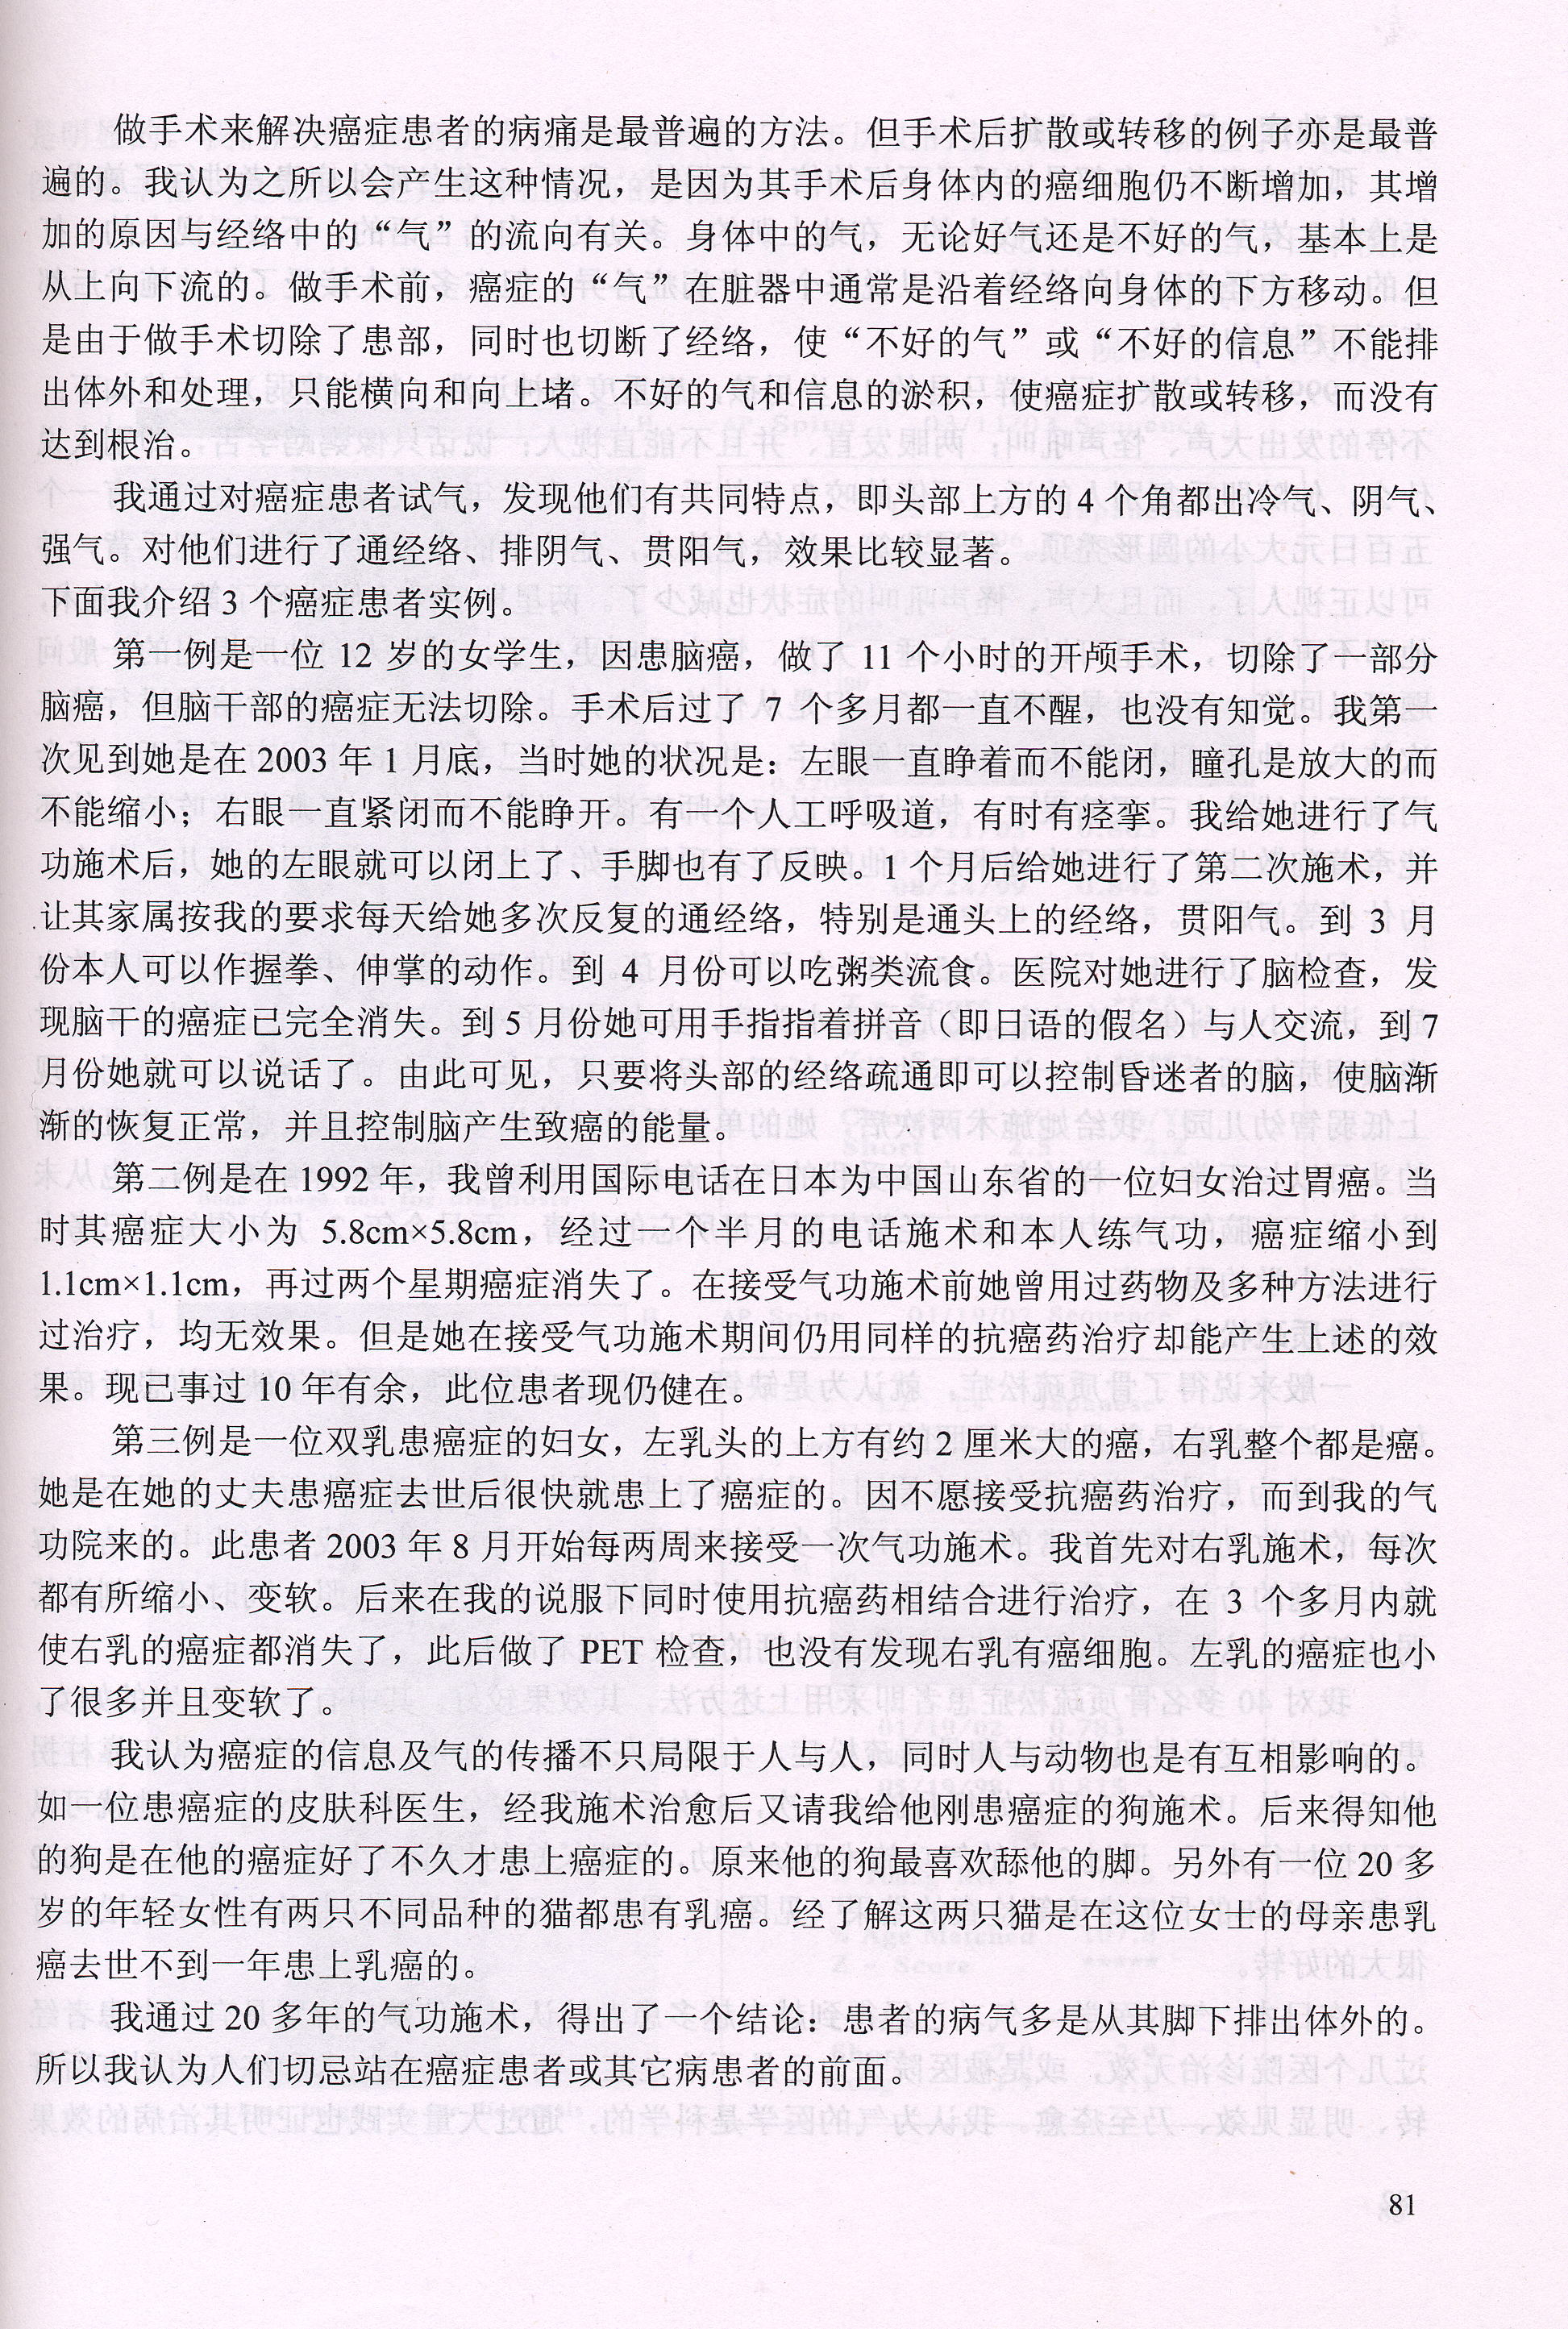 青島大明著 世界医学気功学会発表論文『応用「気の医学」-日本における気功』画像②